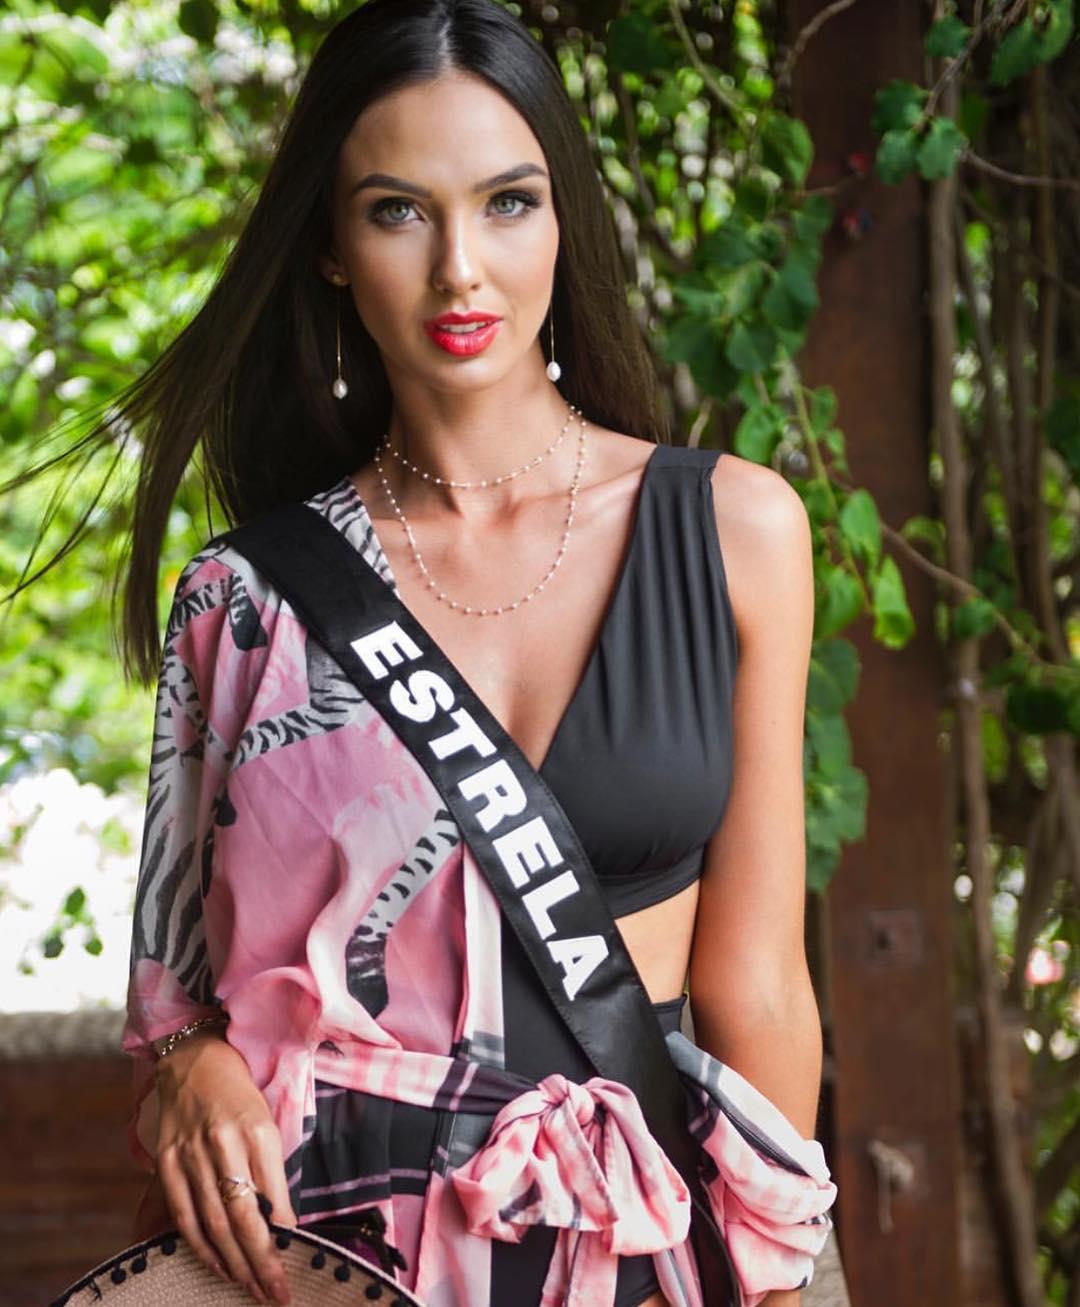 bianca scheren, top 5 de miss brasil universo 2019. - Página 3 49596411